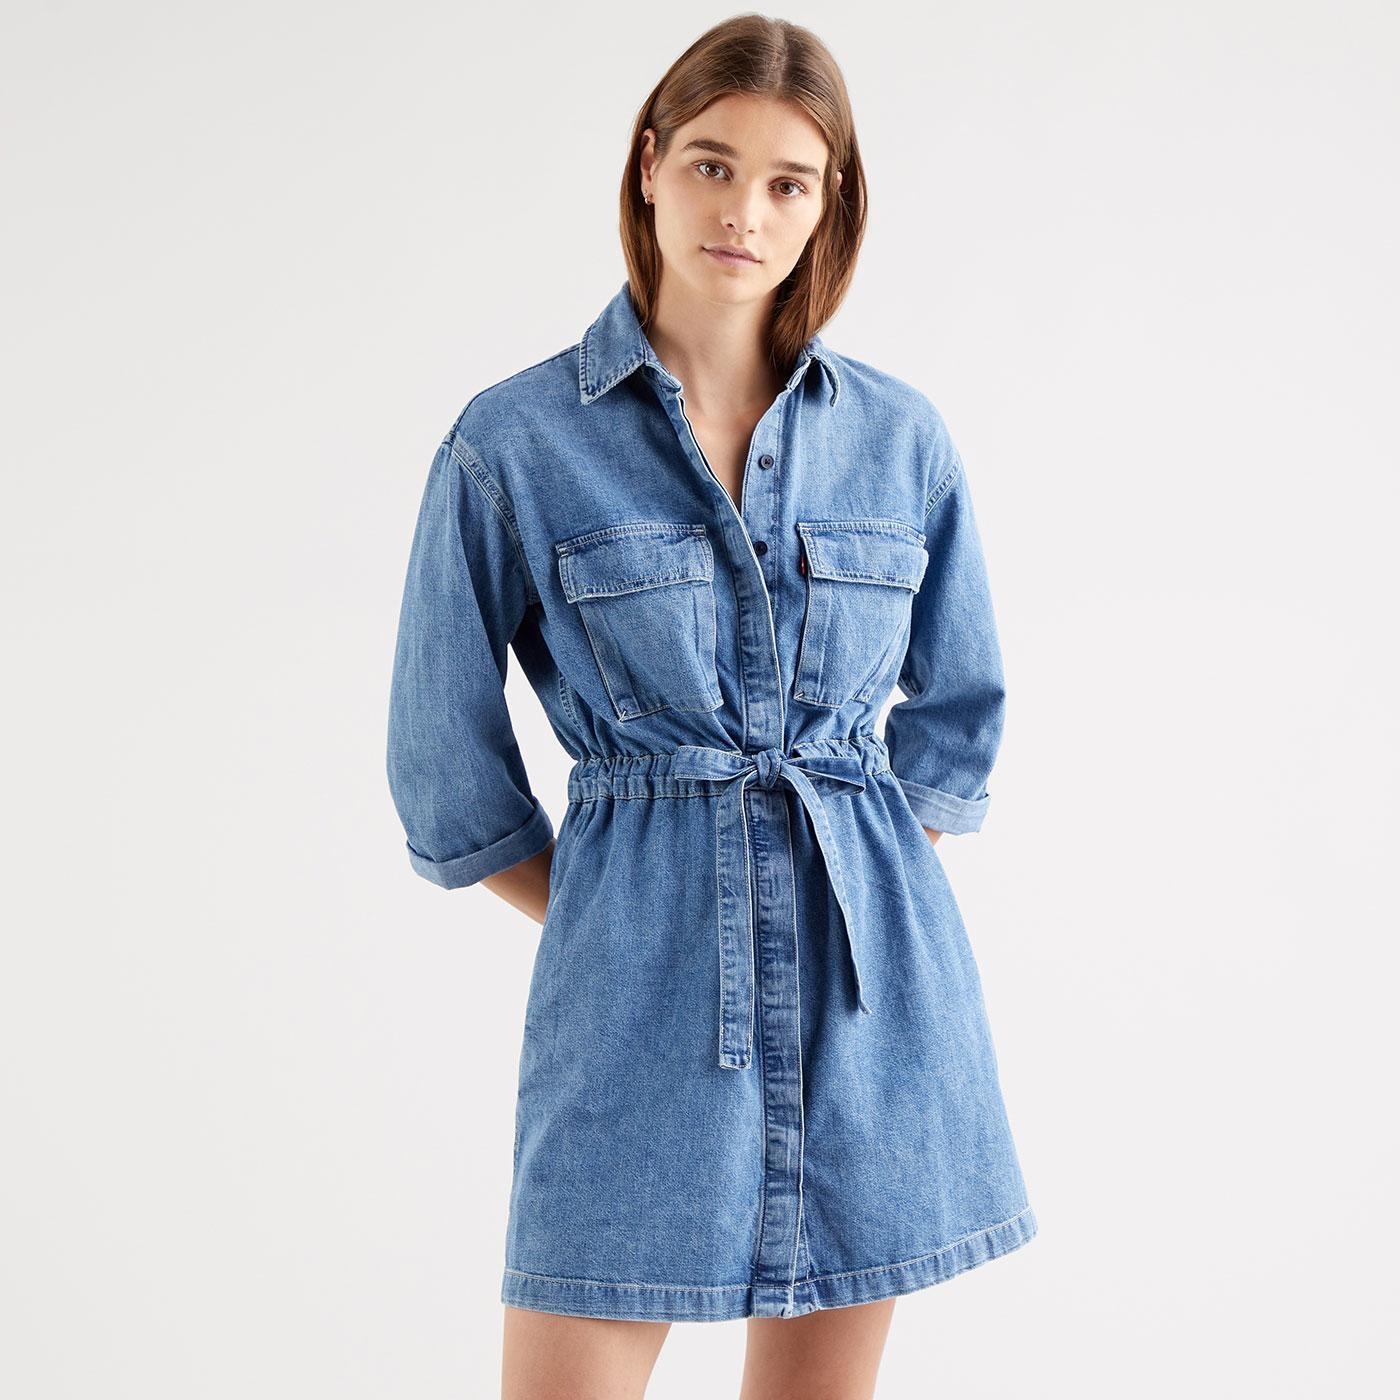 Ainsley LEVI'S Denim Utility Dress (Freaky Friday)